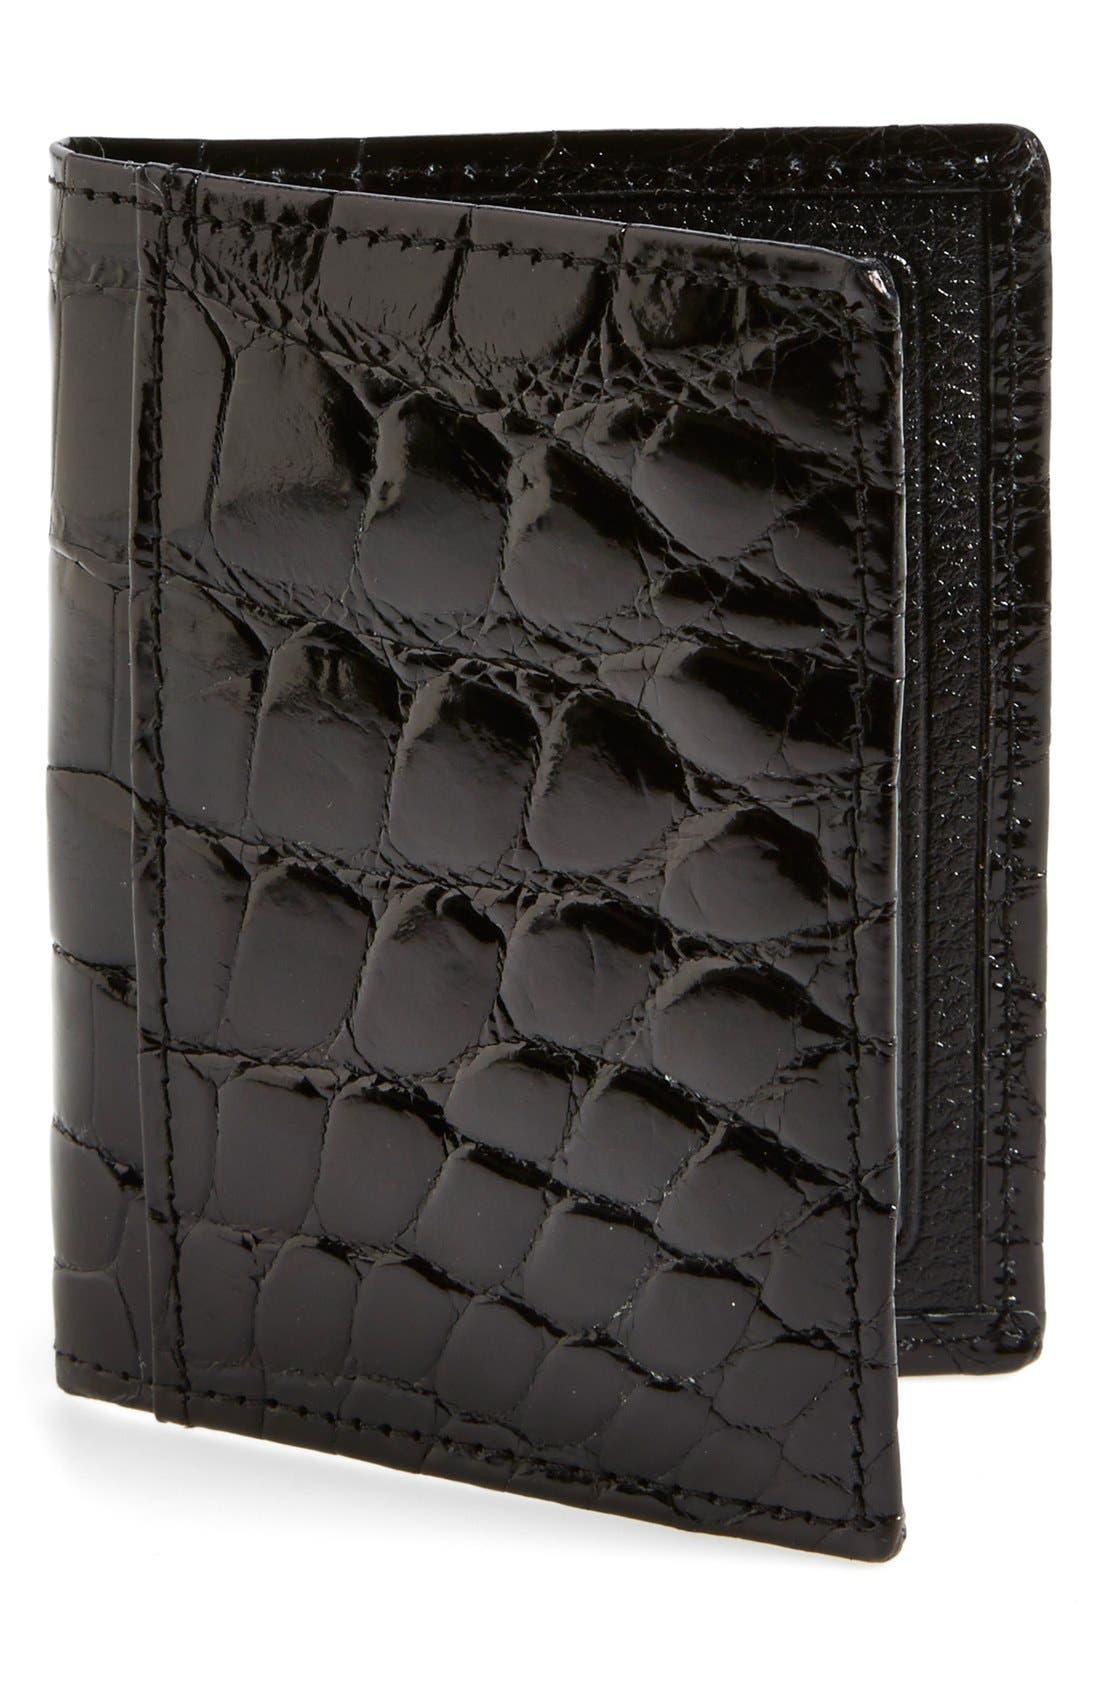 'Joseph' Genuine American Alligator Leather ID Wallet,                             Main thumbnail 1, color,                             001